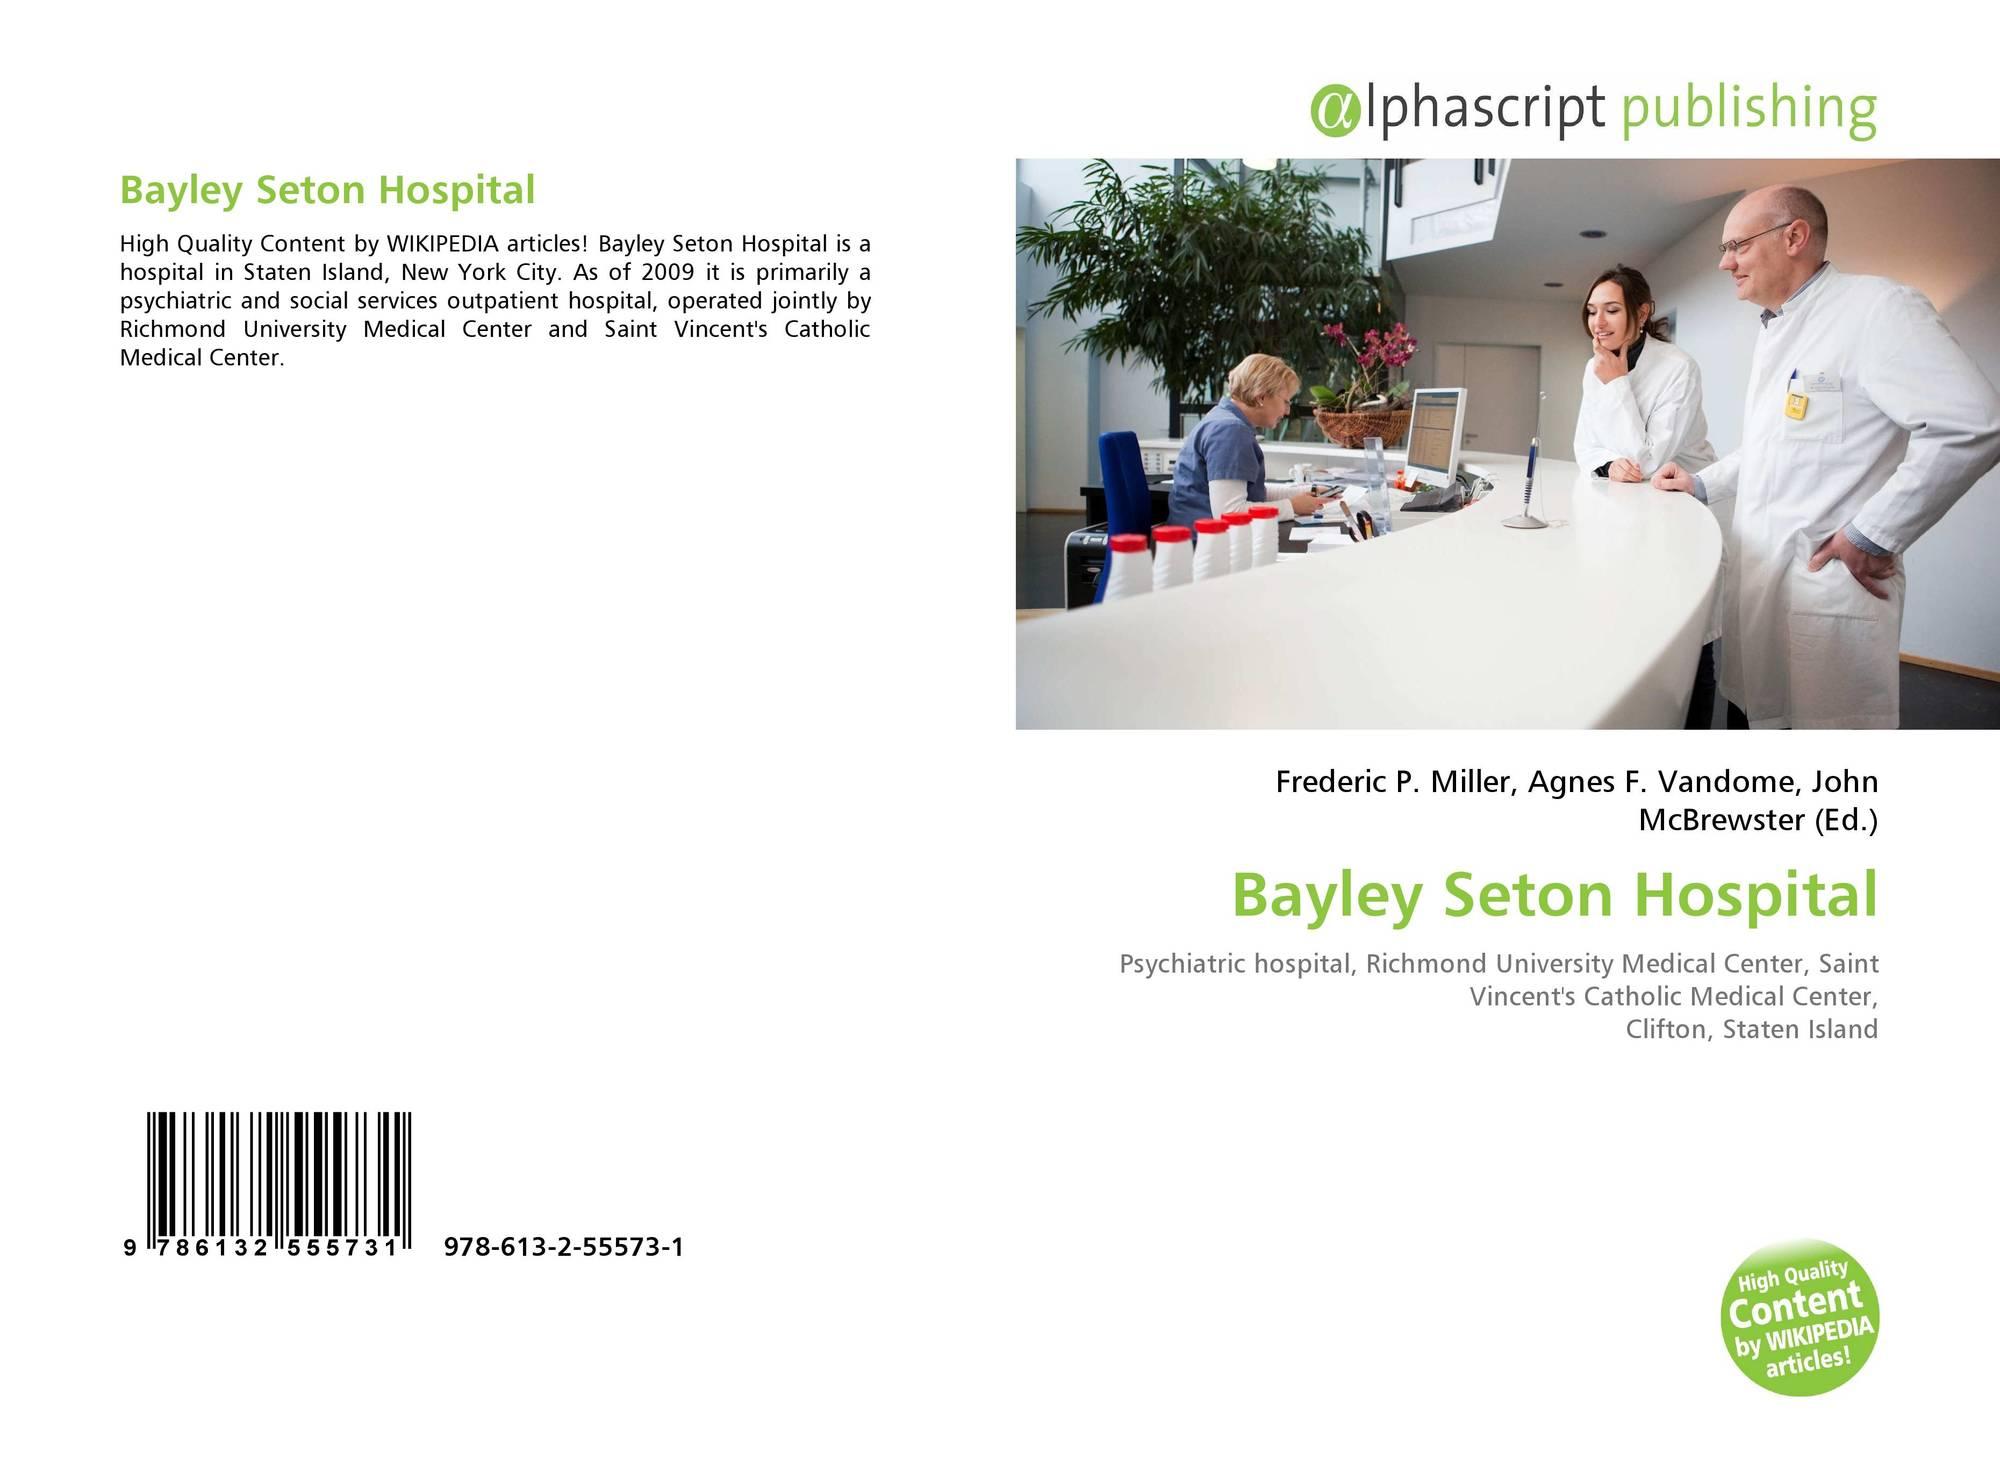 Bayley Seton Hospital, 978-613-2-55573-1, 6132555730 ,9786132555731